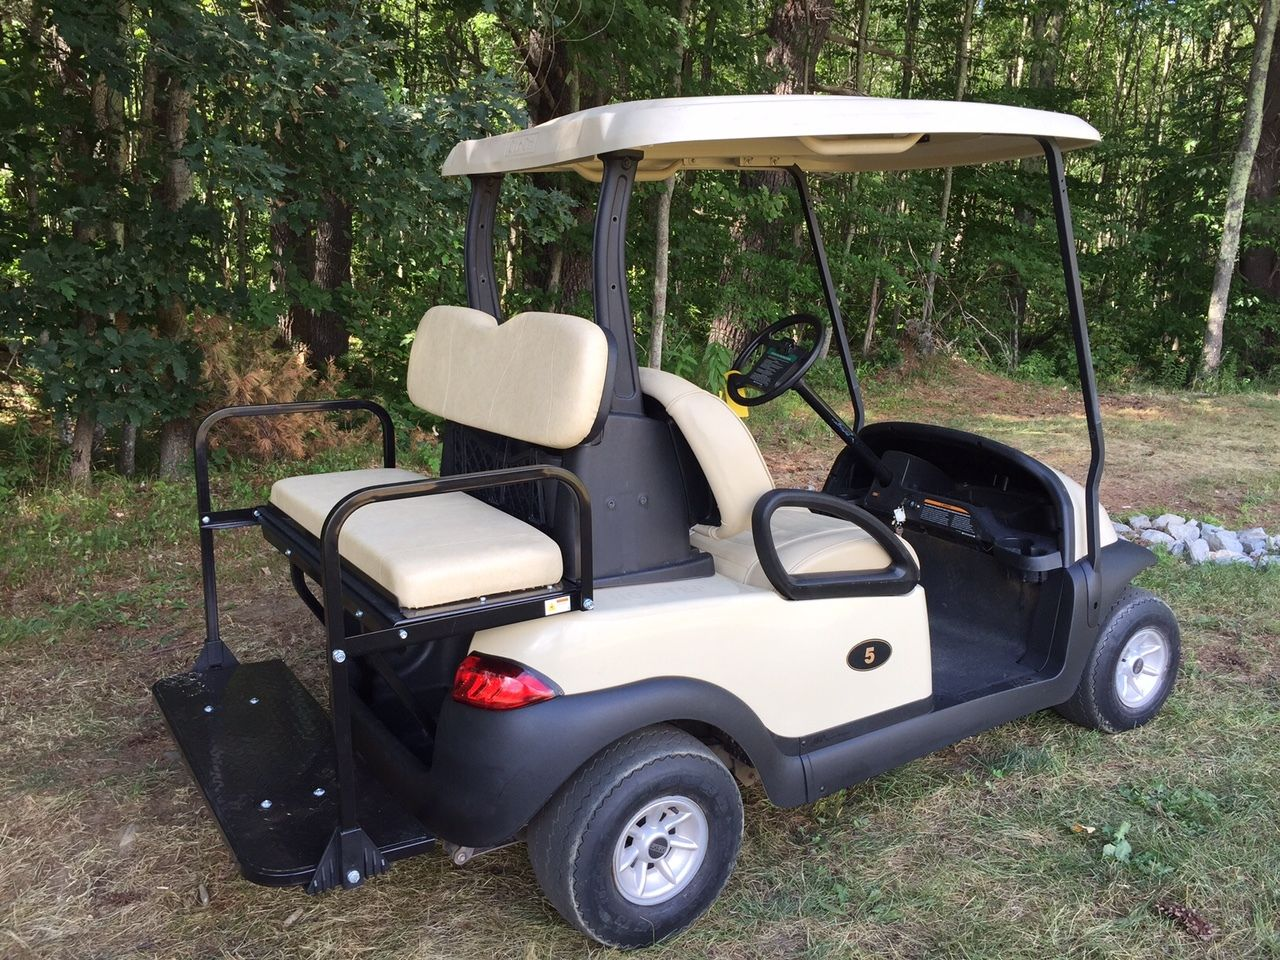 Electric 2014 Club Car Precedent Golf Cart For Sale